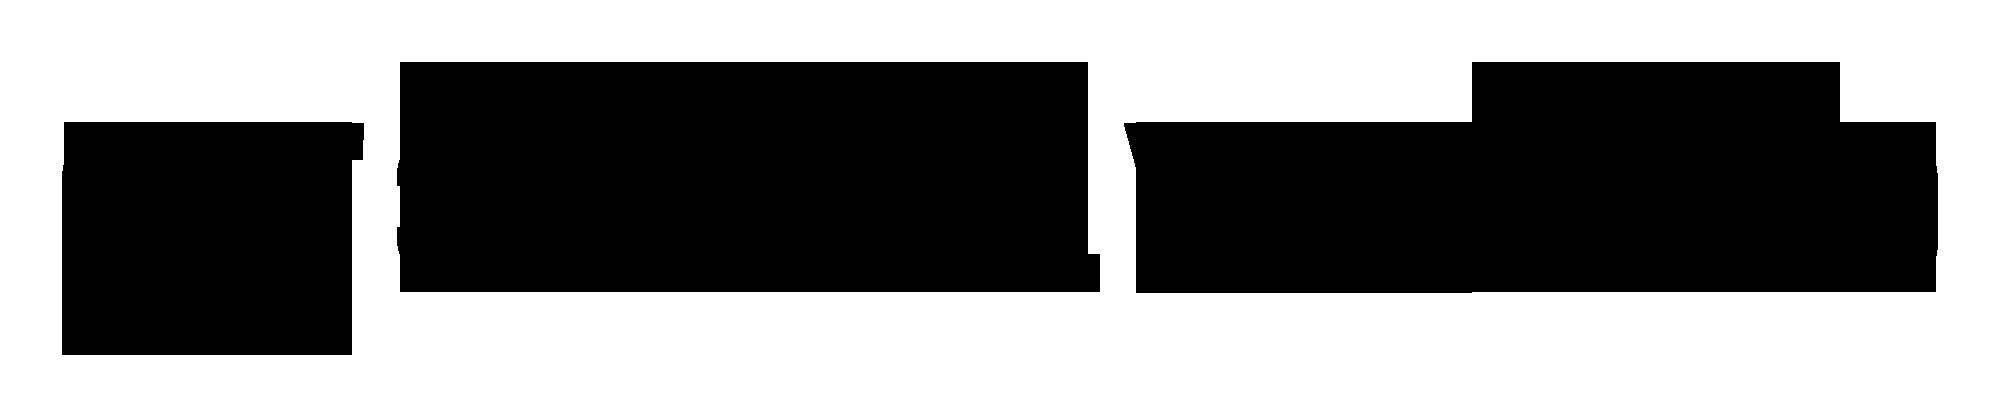 Prohelvetia_Logo_black_large.png